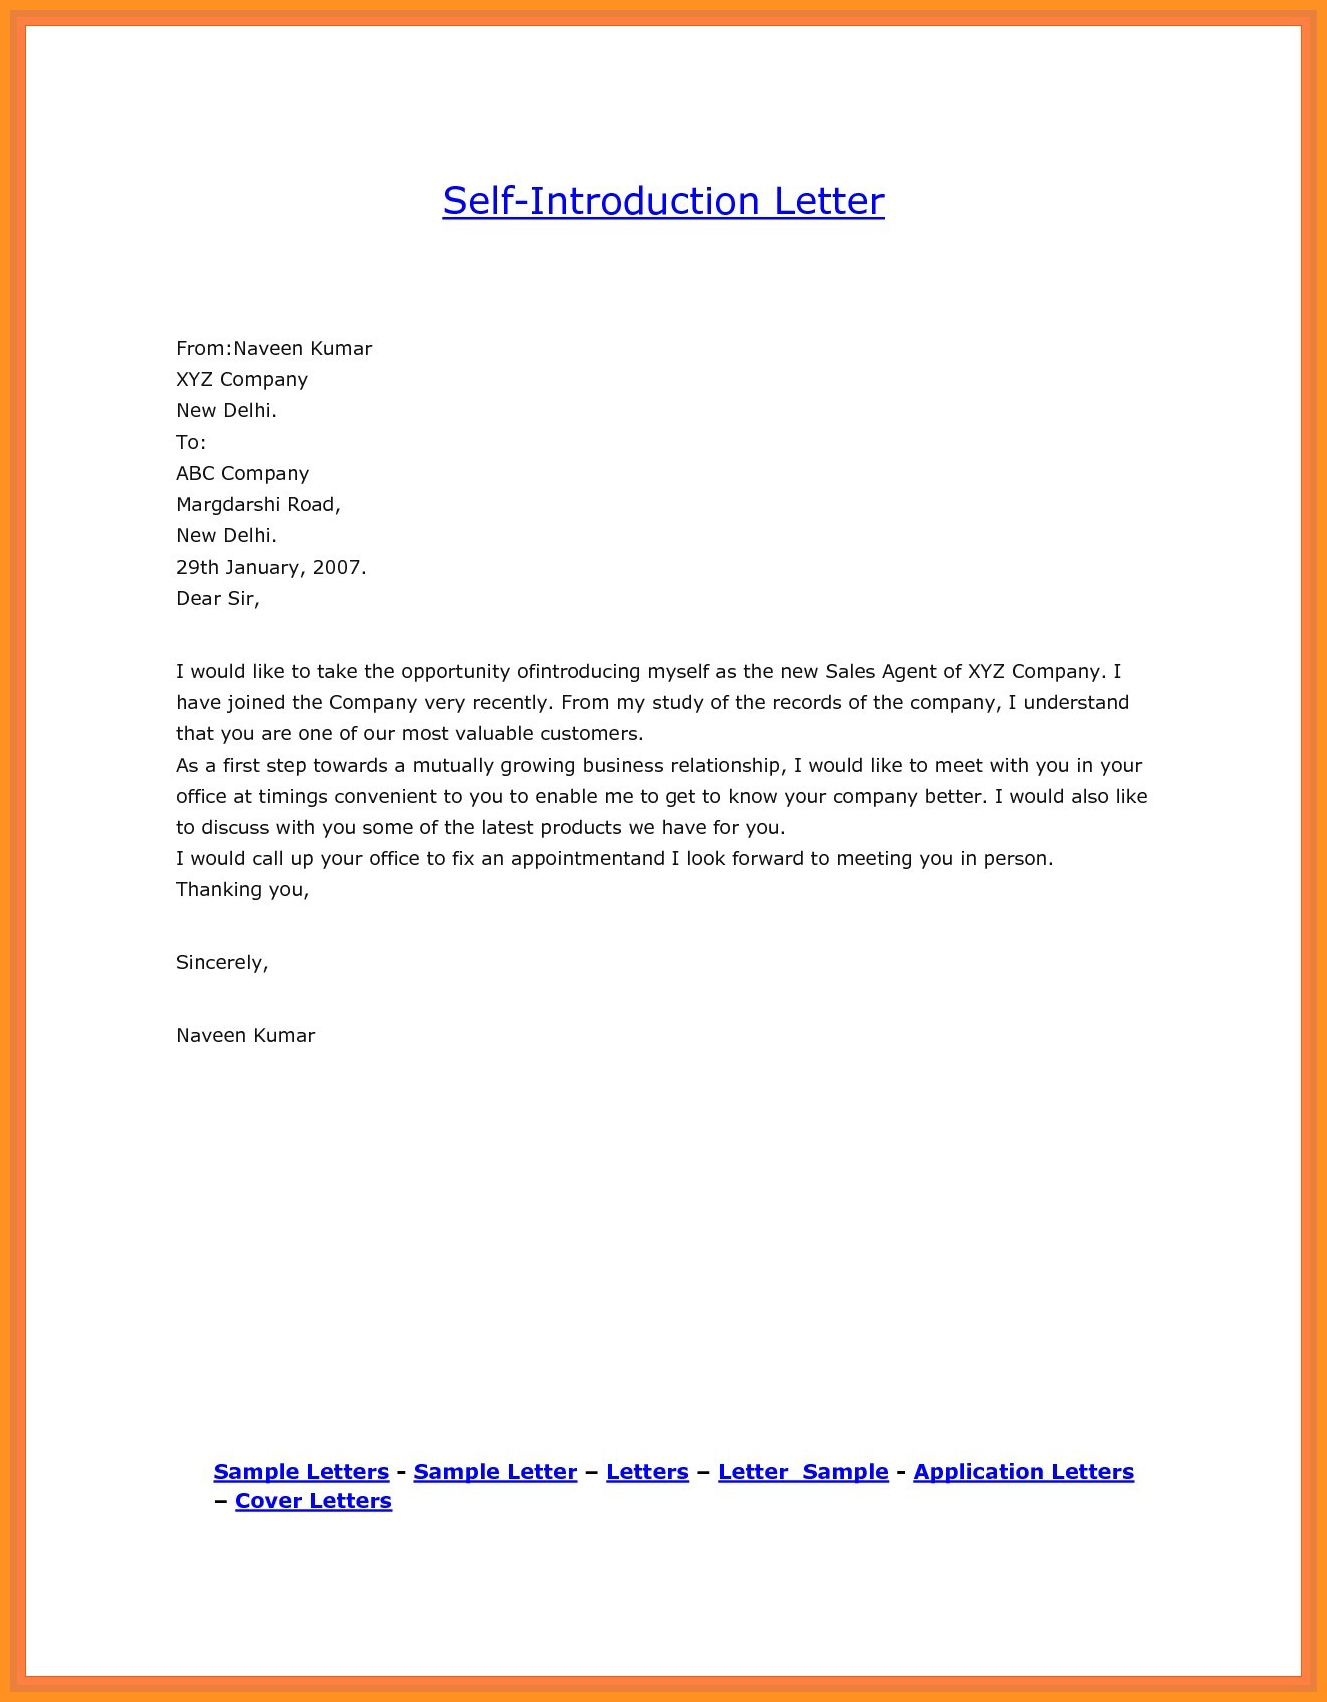 Valid Introduction Letter For A Job Sample You Can Download For Full Letter Resume Templ Introduction Letter Business Letter Format Introduction Letter For Job